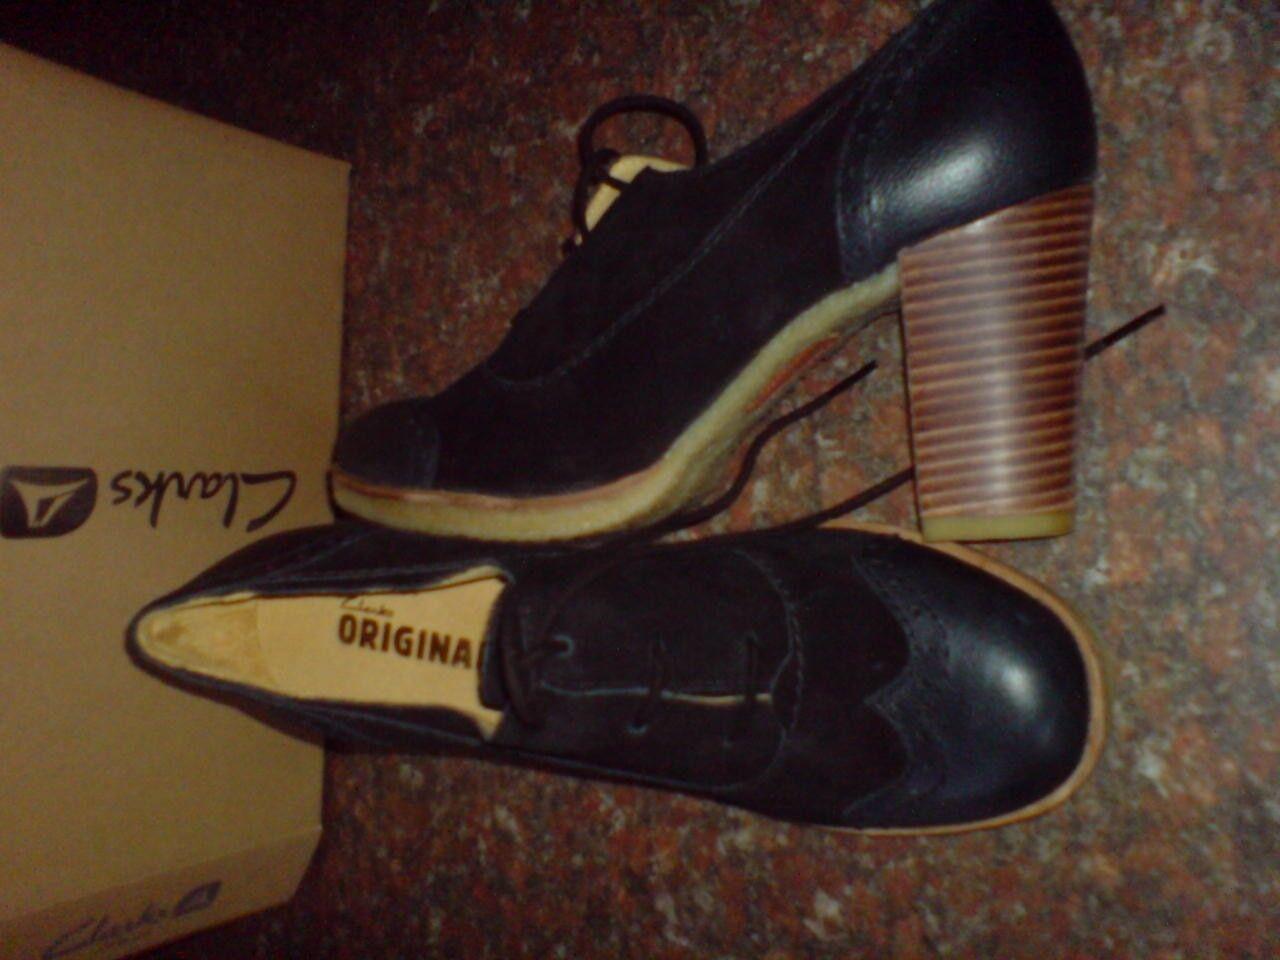 Clarks Original kombi Damen Kitzi Spaß Sand oder schwarz kombi Original Veloursleder UK 8/7.5 0a3b97